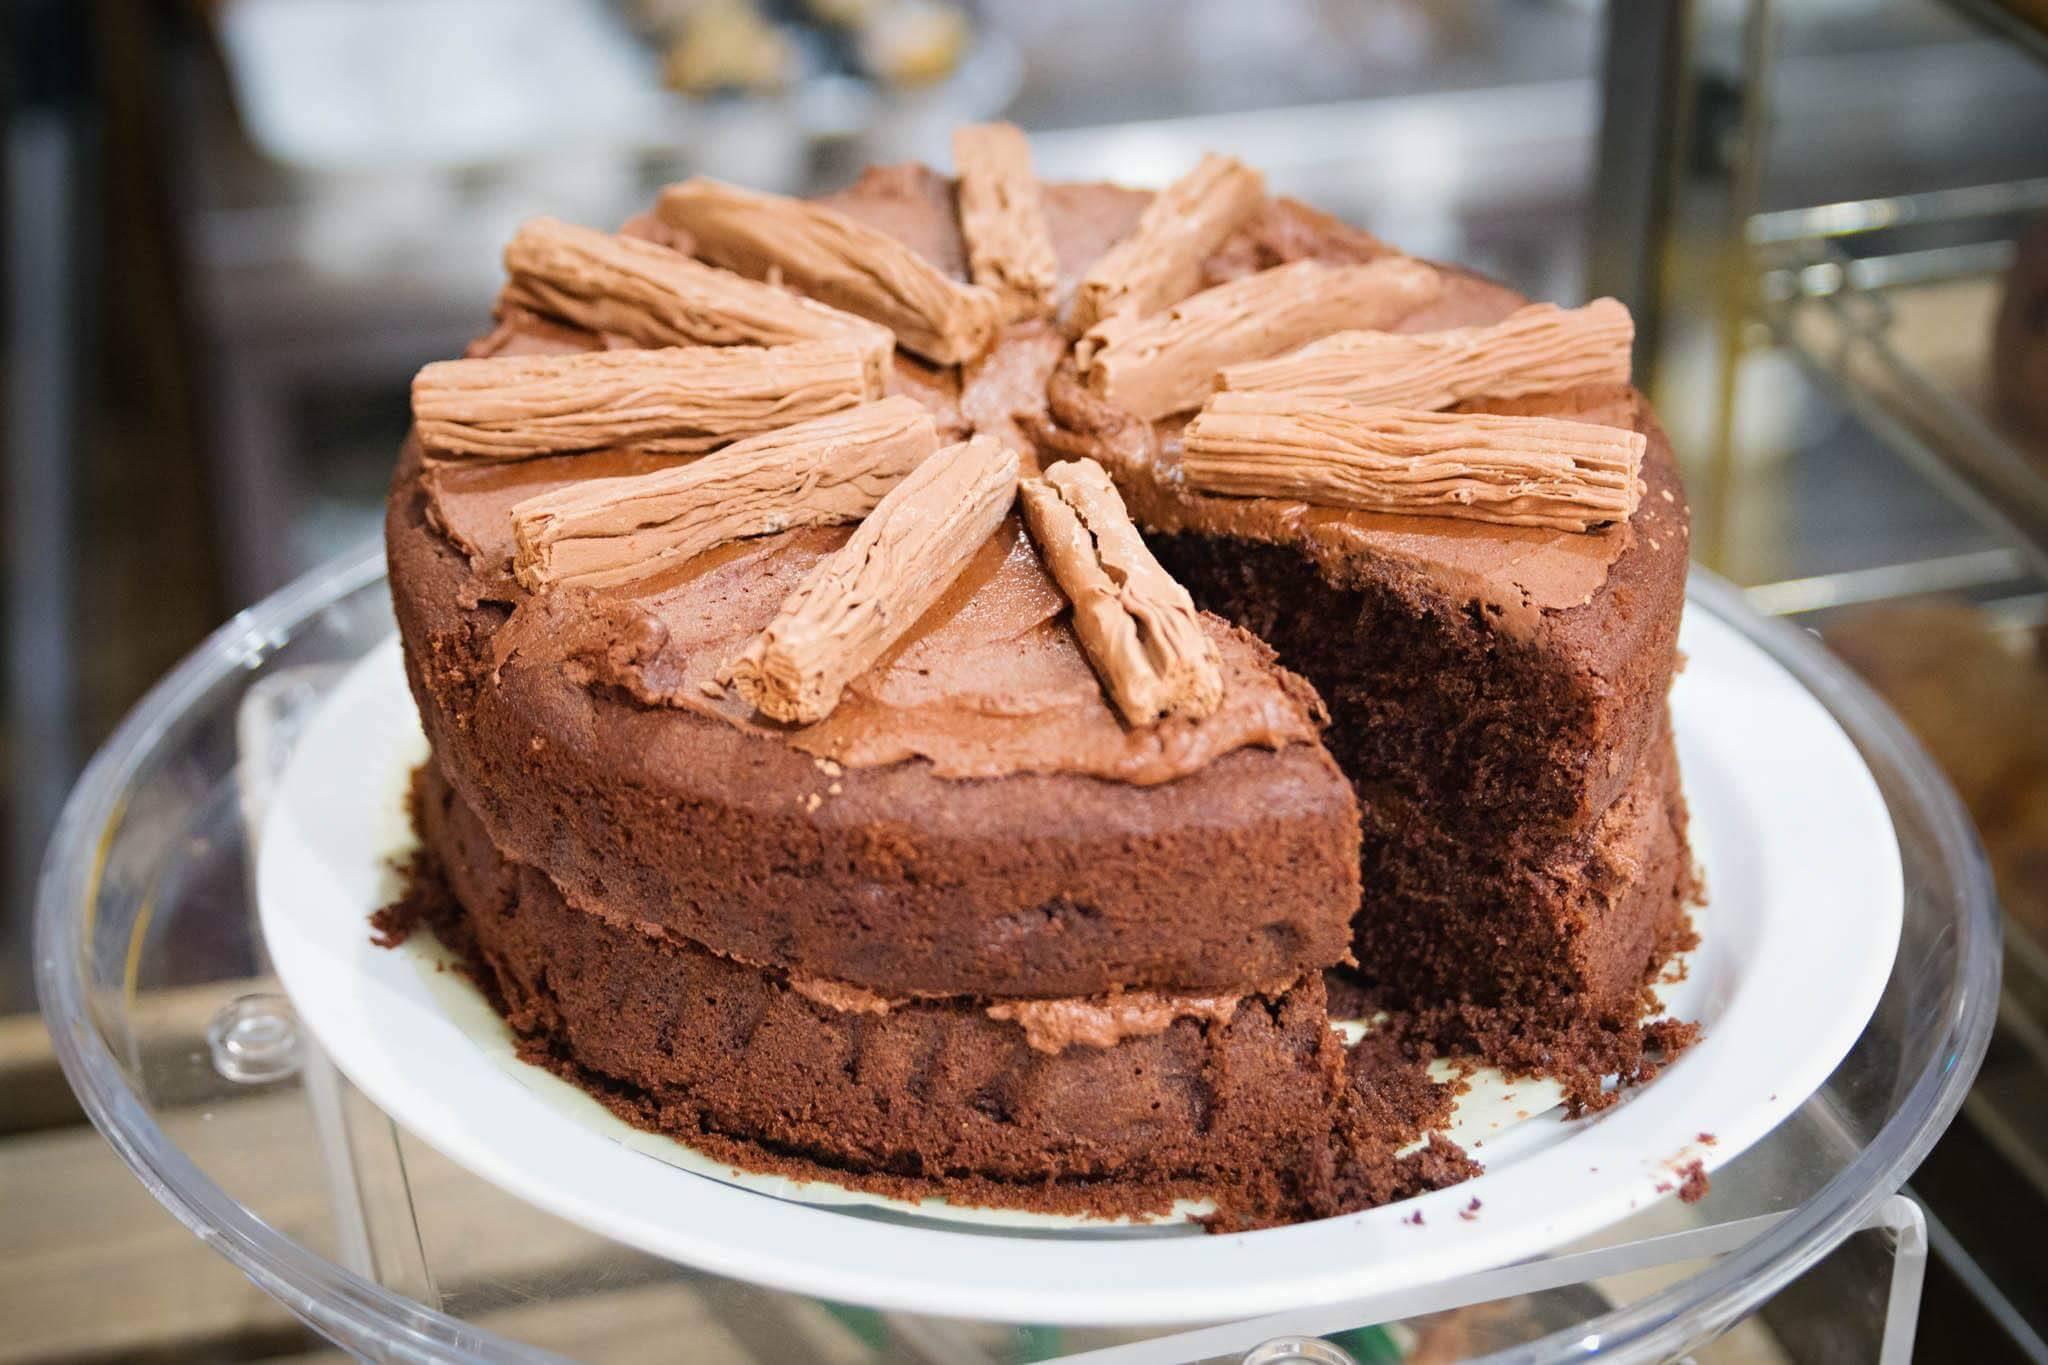 Choc-cake-Wilton.jpg